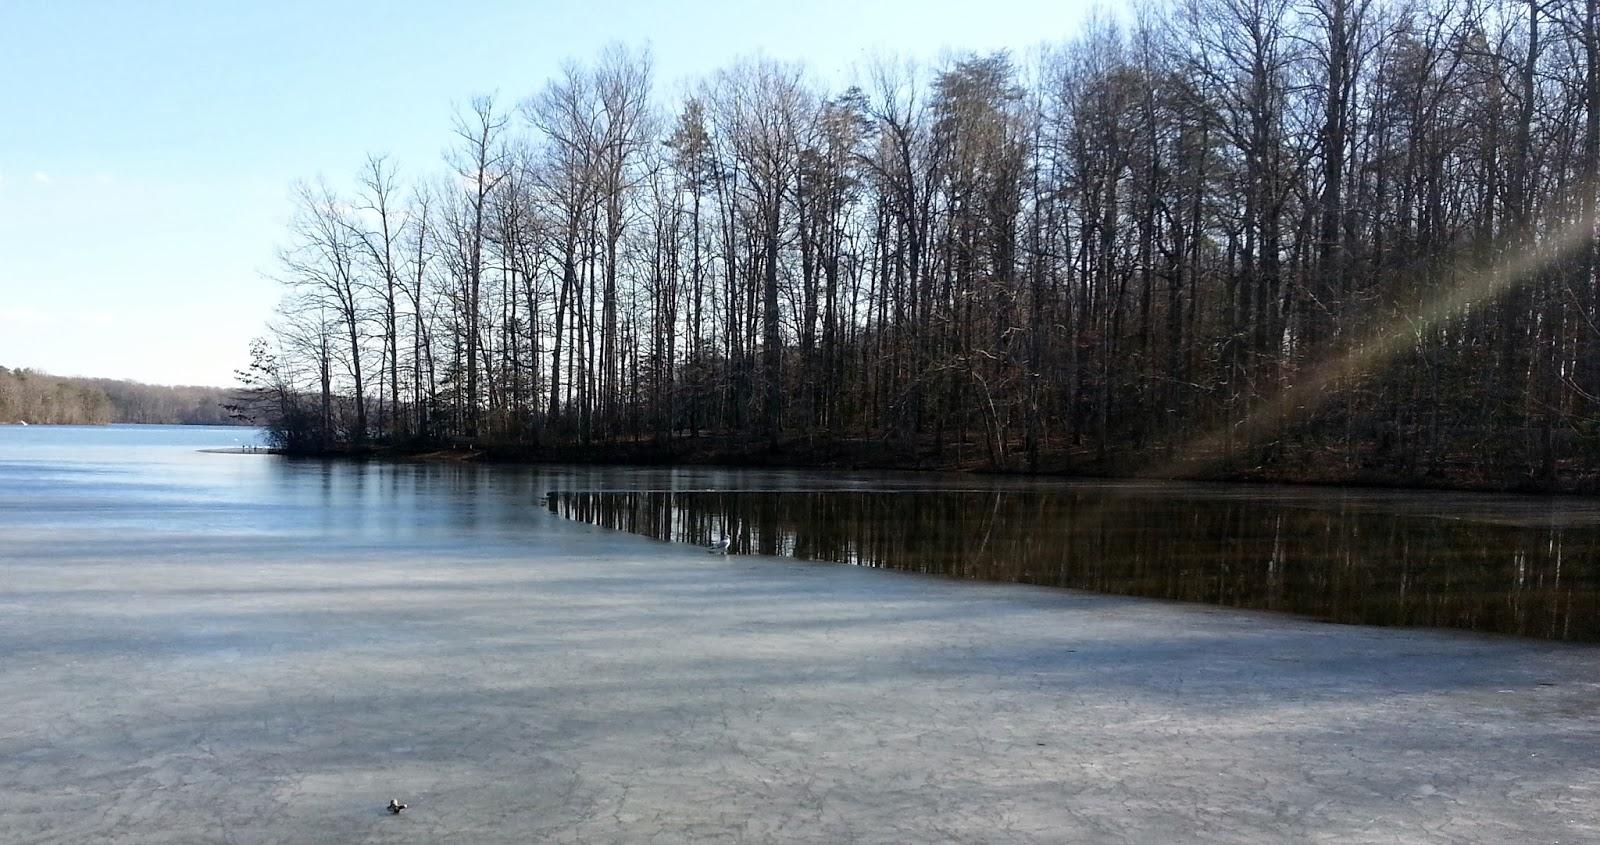 Ben 39 s journal first trail run of the year burke lake for Burke lake fishing